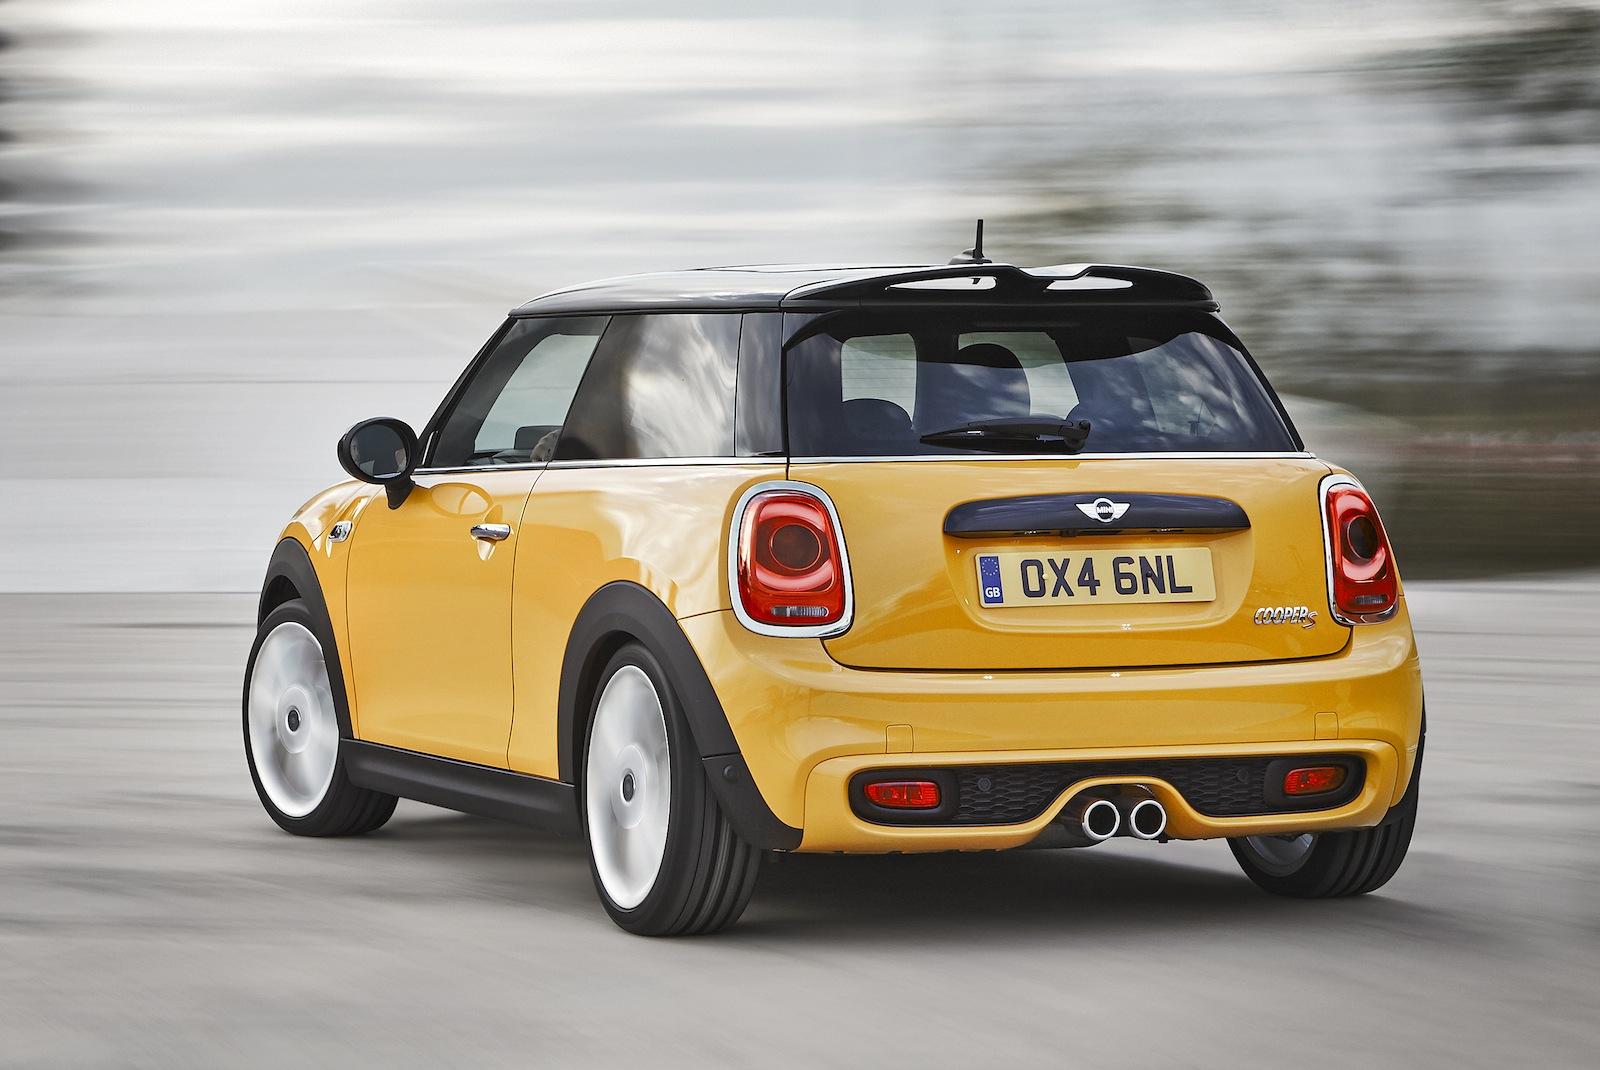 2014 Mini Cooper hatch revealed - Photos (1 of 14)